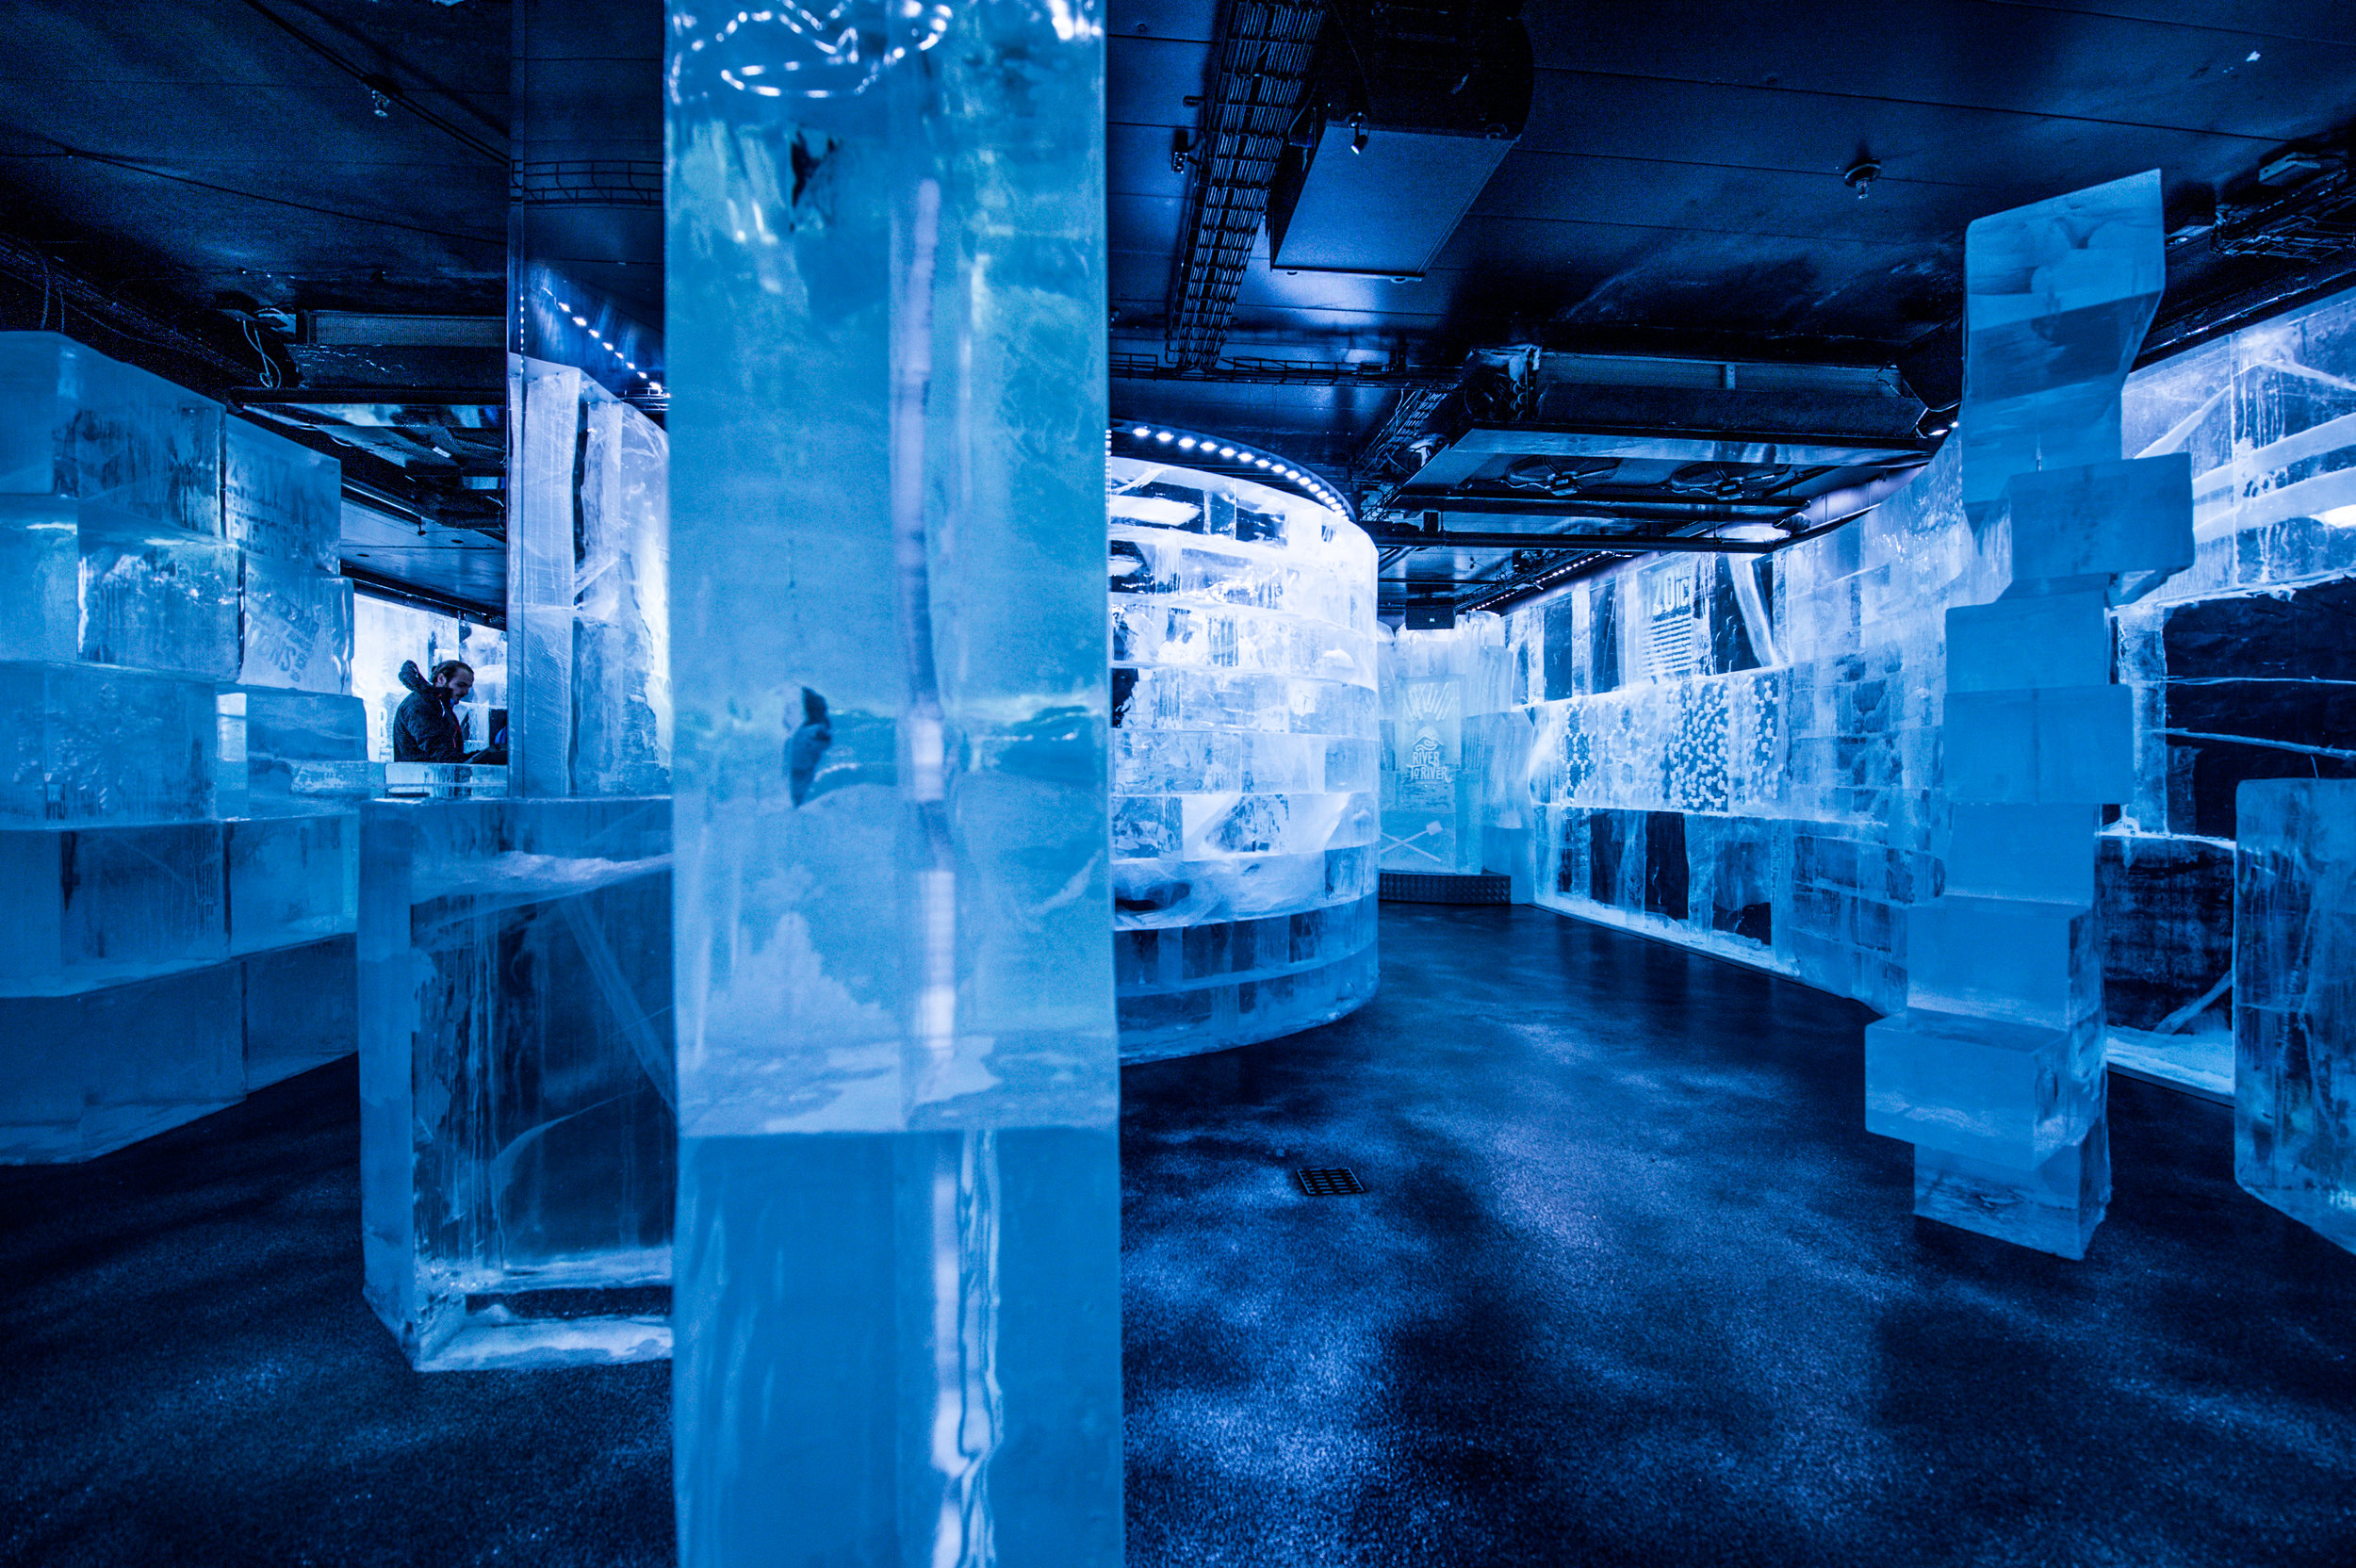 ICEBAR 2017 - Kalle Ekeroth, John Pettersson, Tjåsa Lucia Gusfors, Jon Nilsson, Mats Nilsson ,Mattias Eriksson. - by Asaf Kliger (11 of 16).jpg